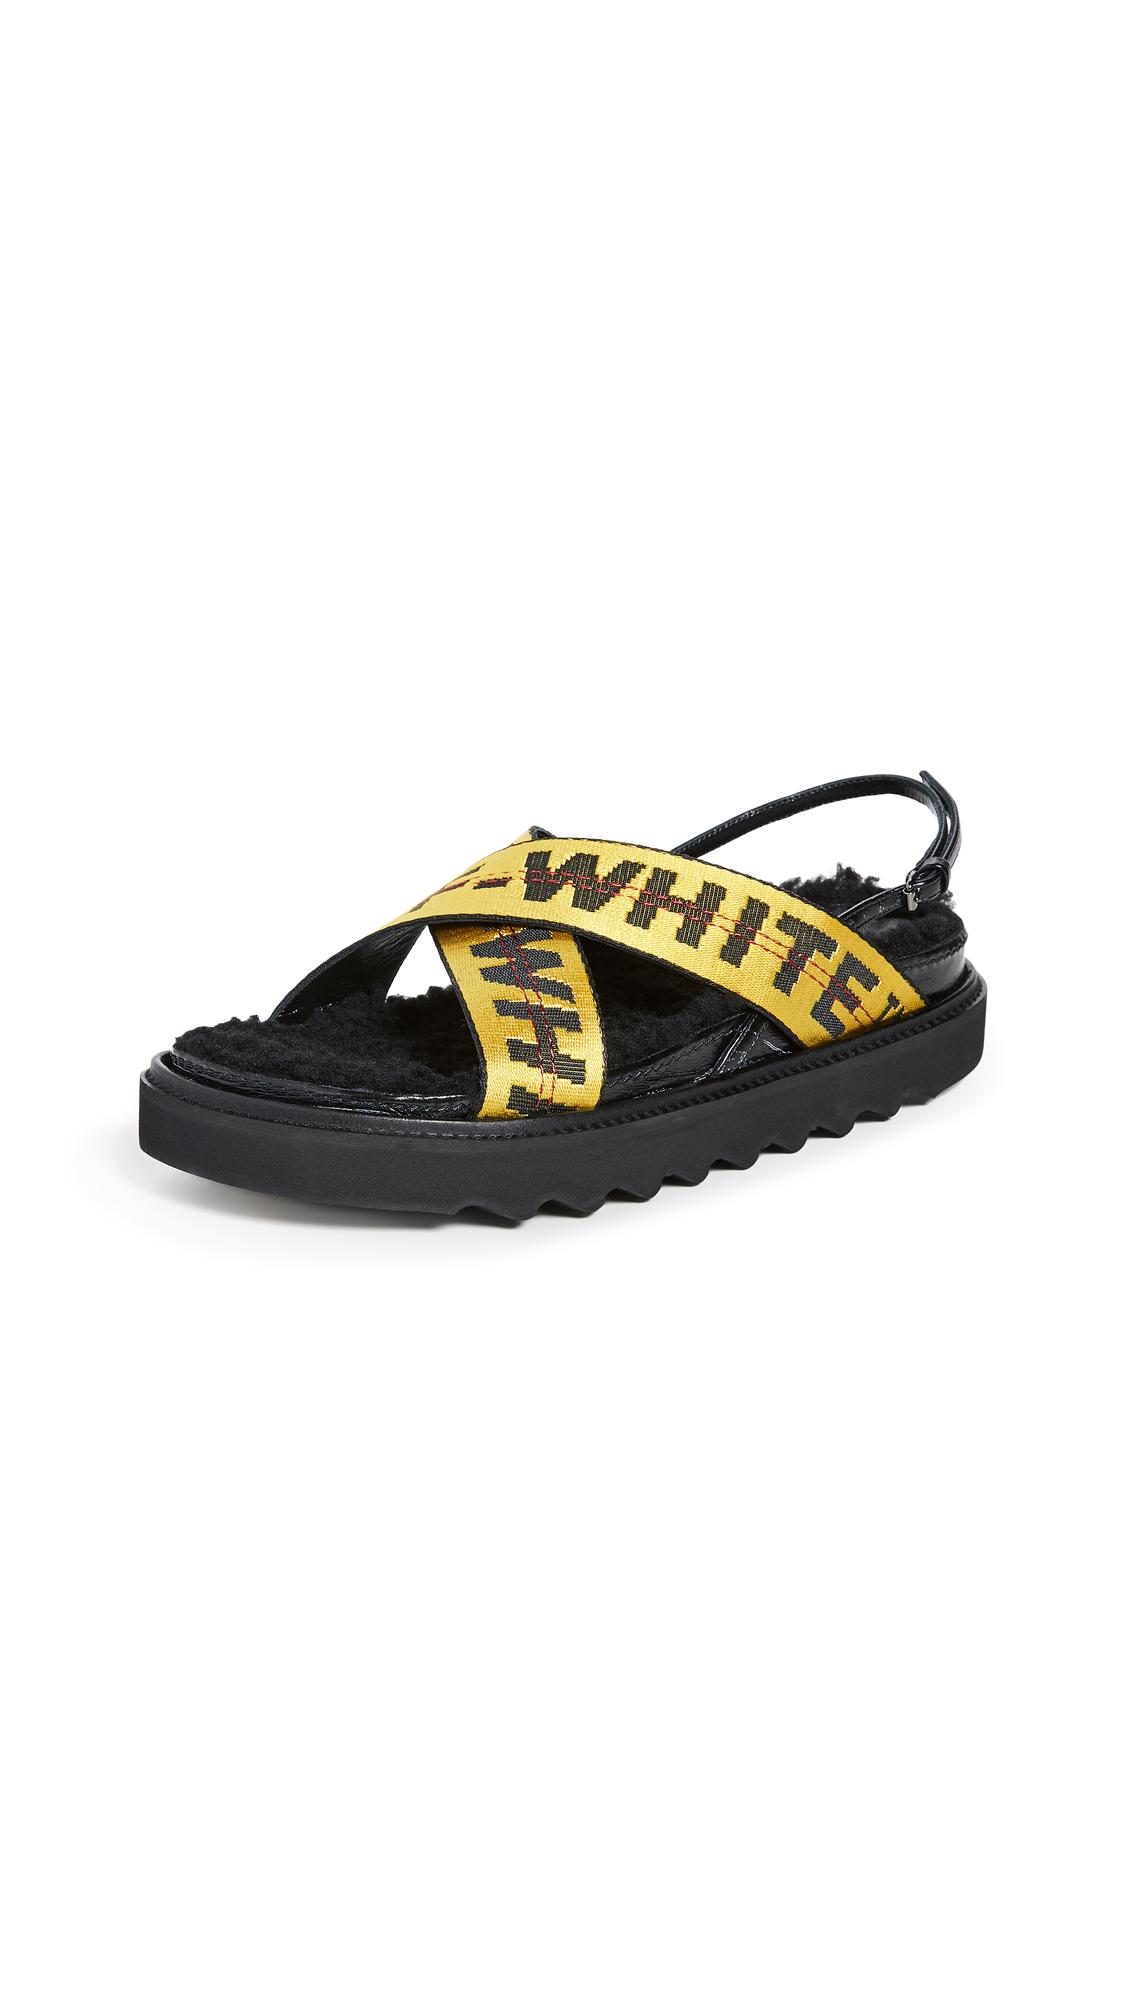 Off-White Off White C/O Virgil Abloh Women's Yellow Industrial Belt Sandals In Black